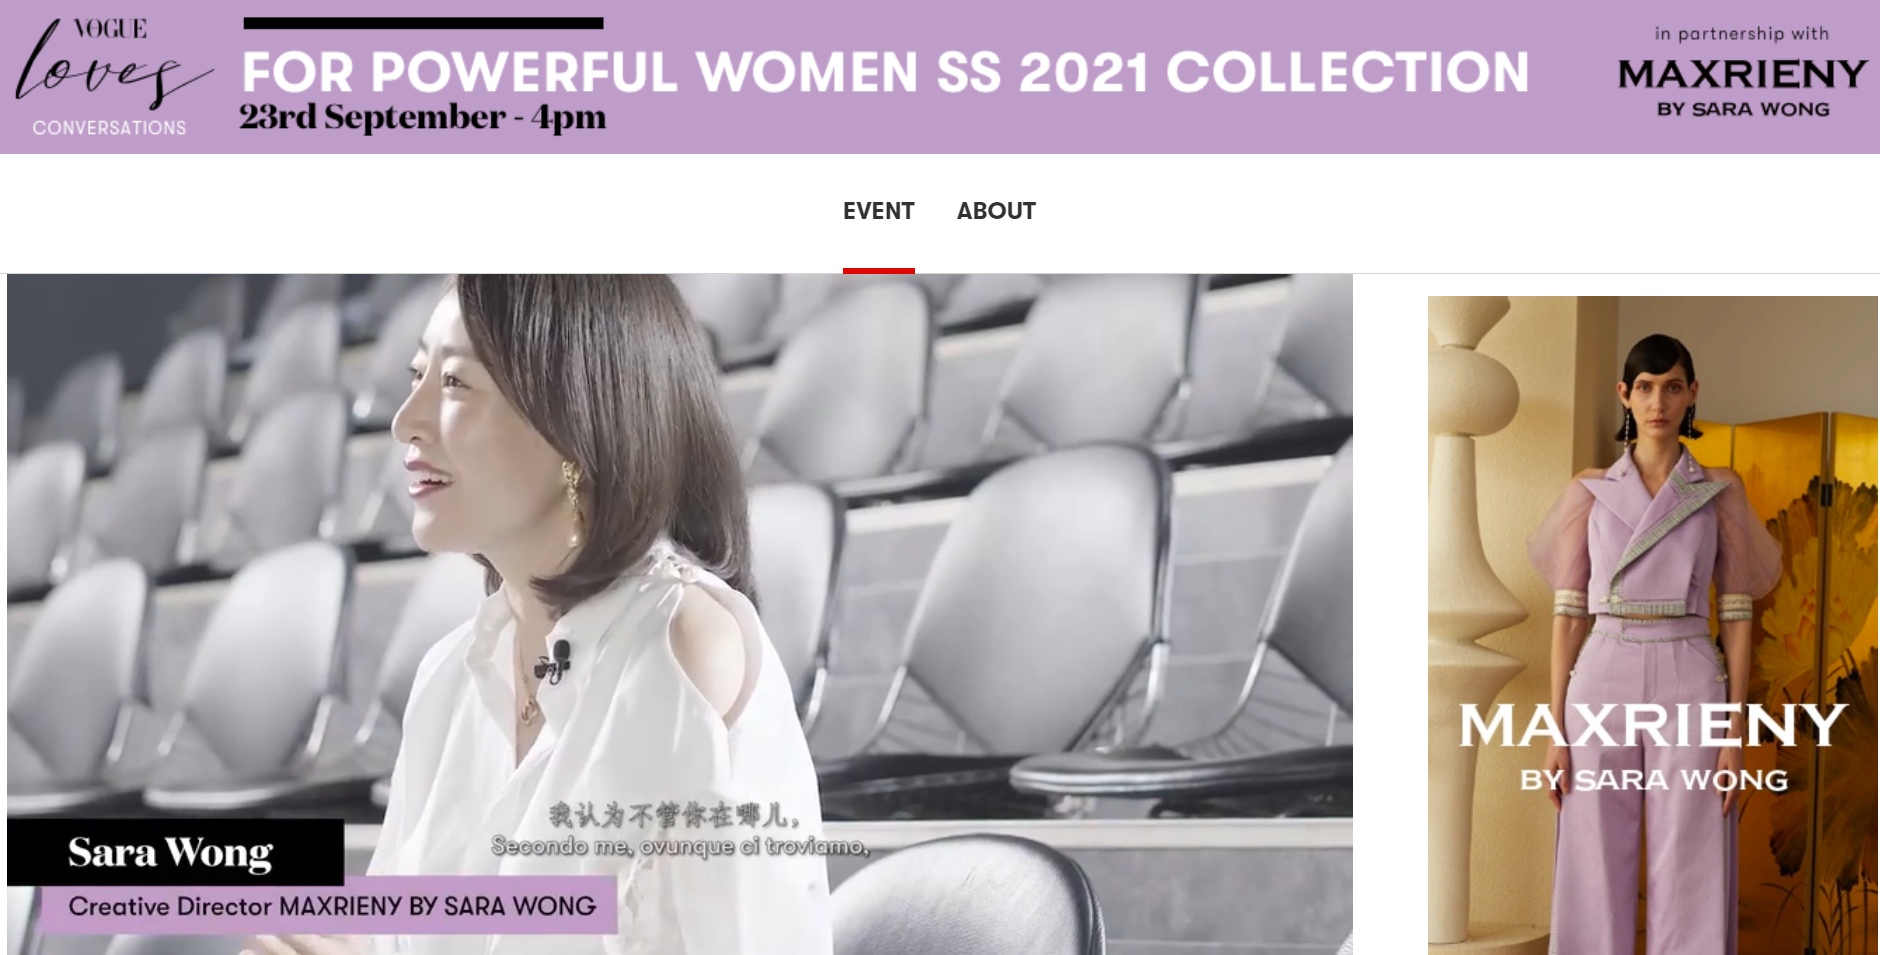 MAXRIENY BY SARA WONG - Benedetta Malavasi - Italy - Vogue Loves Conversation - Sponsor 1